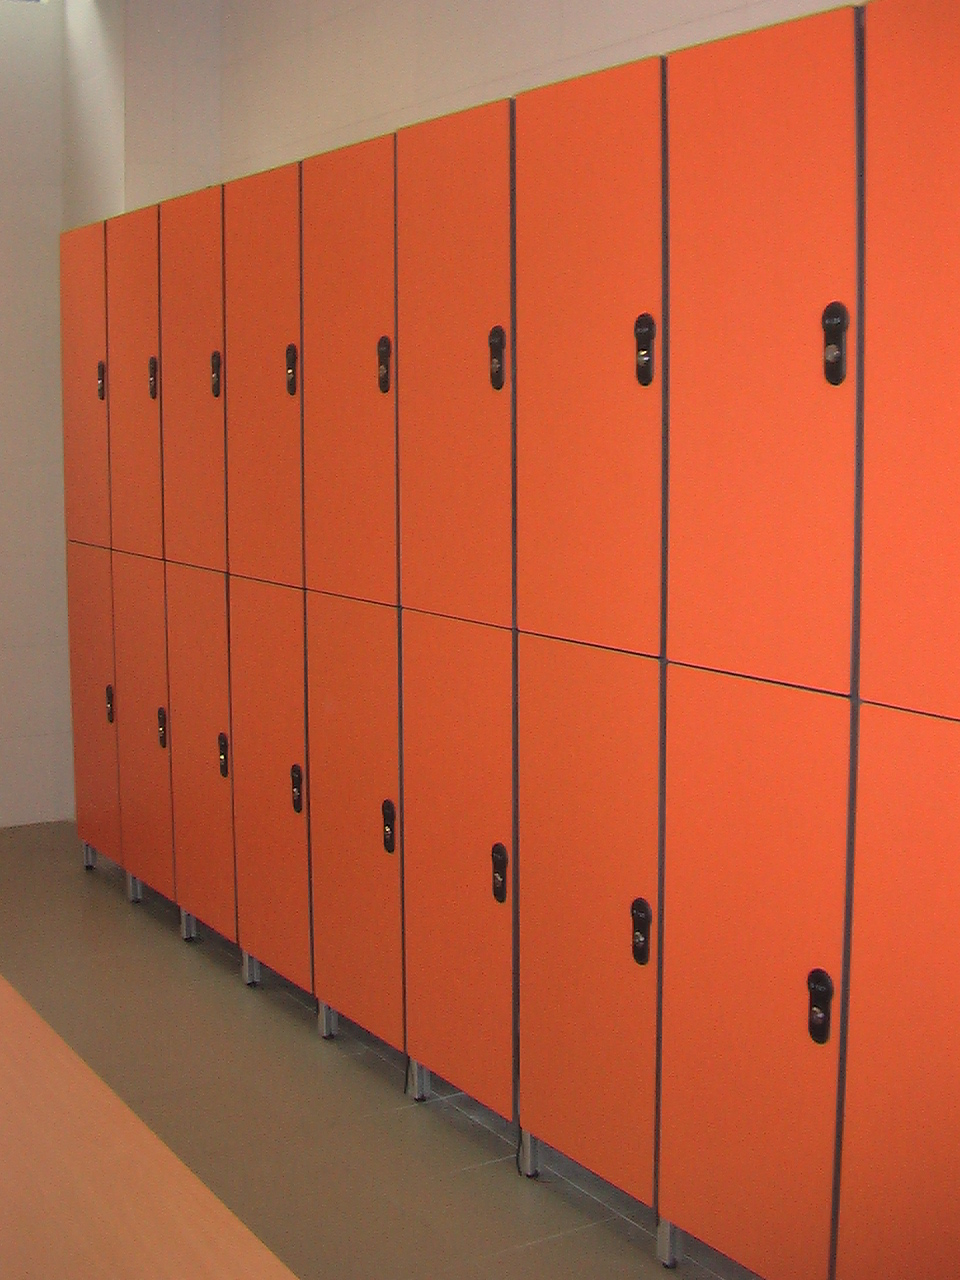 Rich-lees Keyless locks hpl compact golf lockers